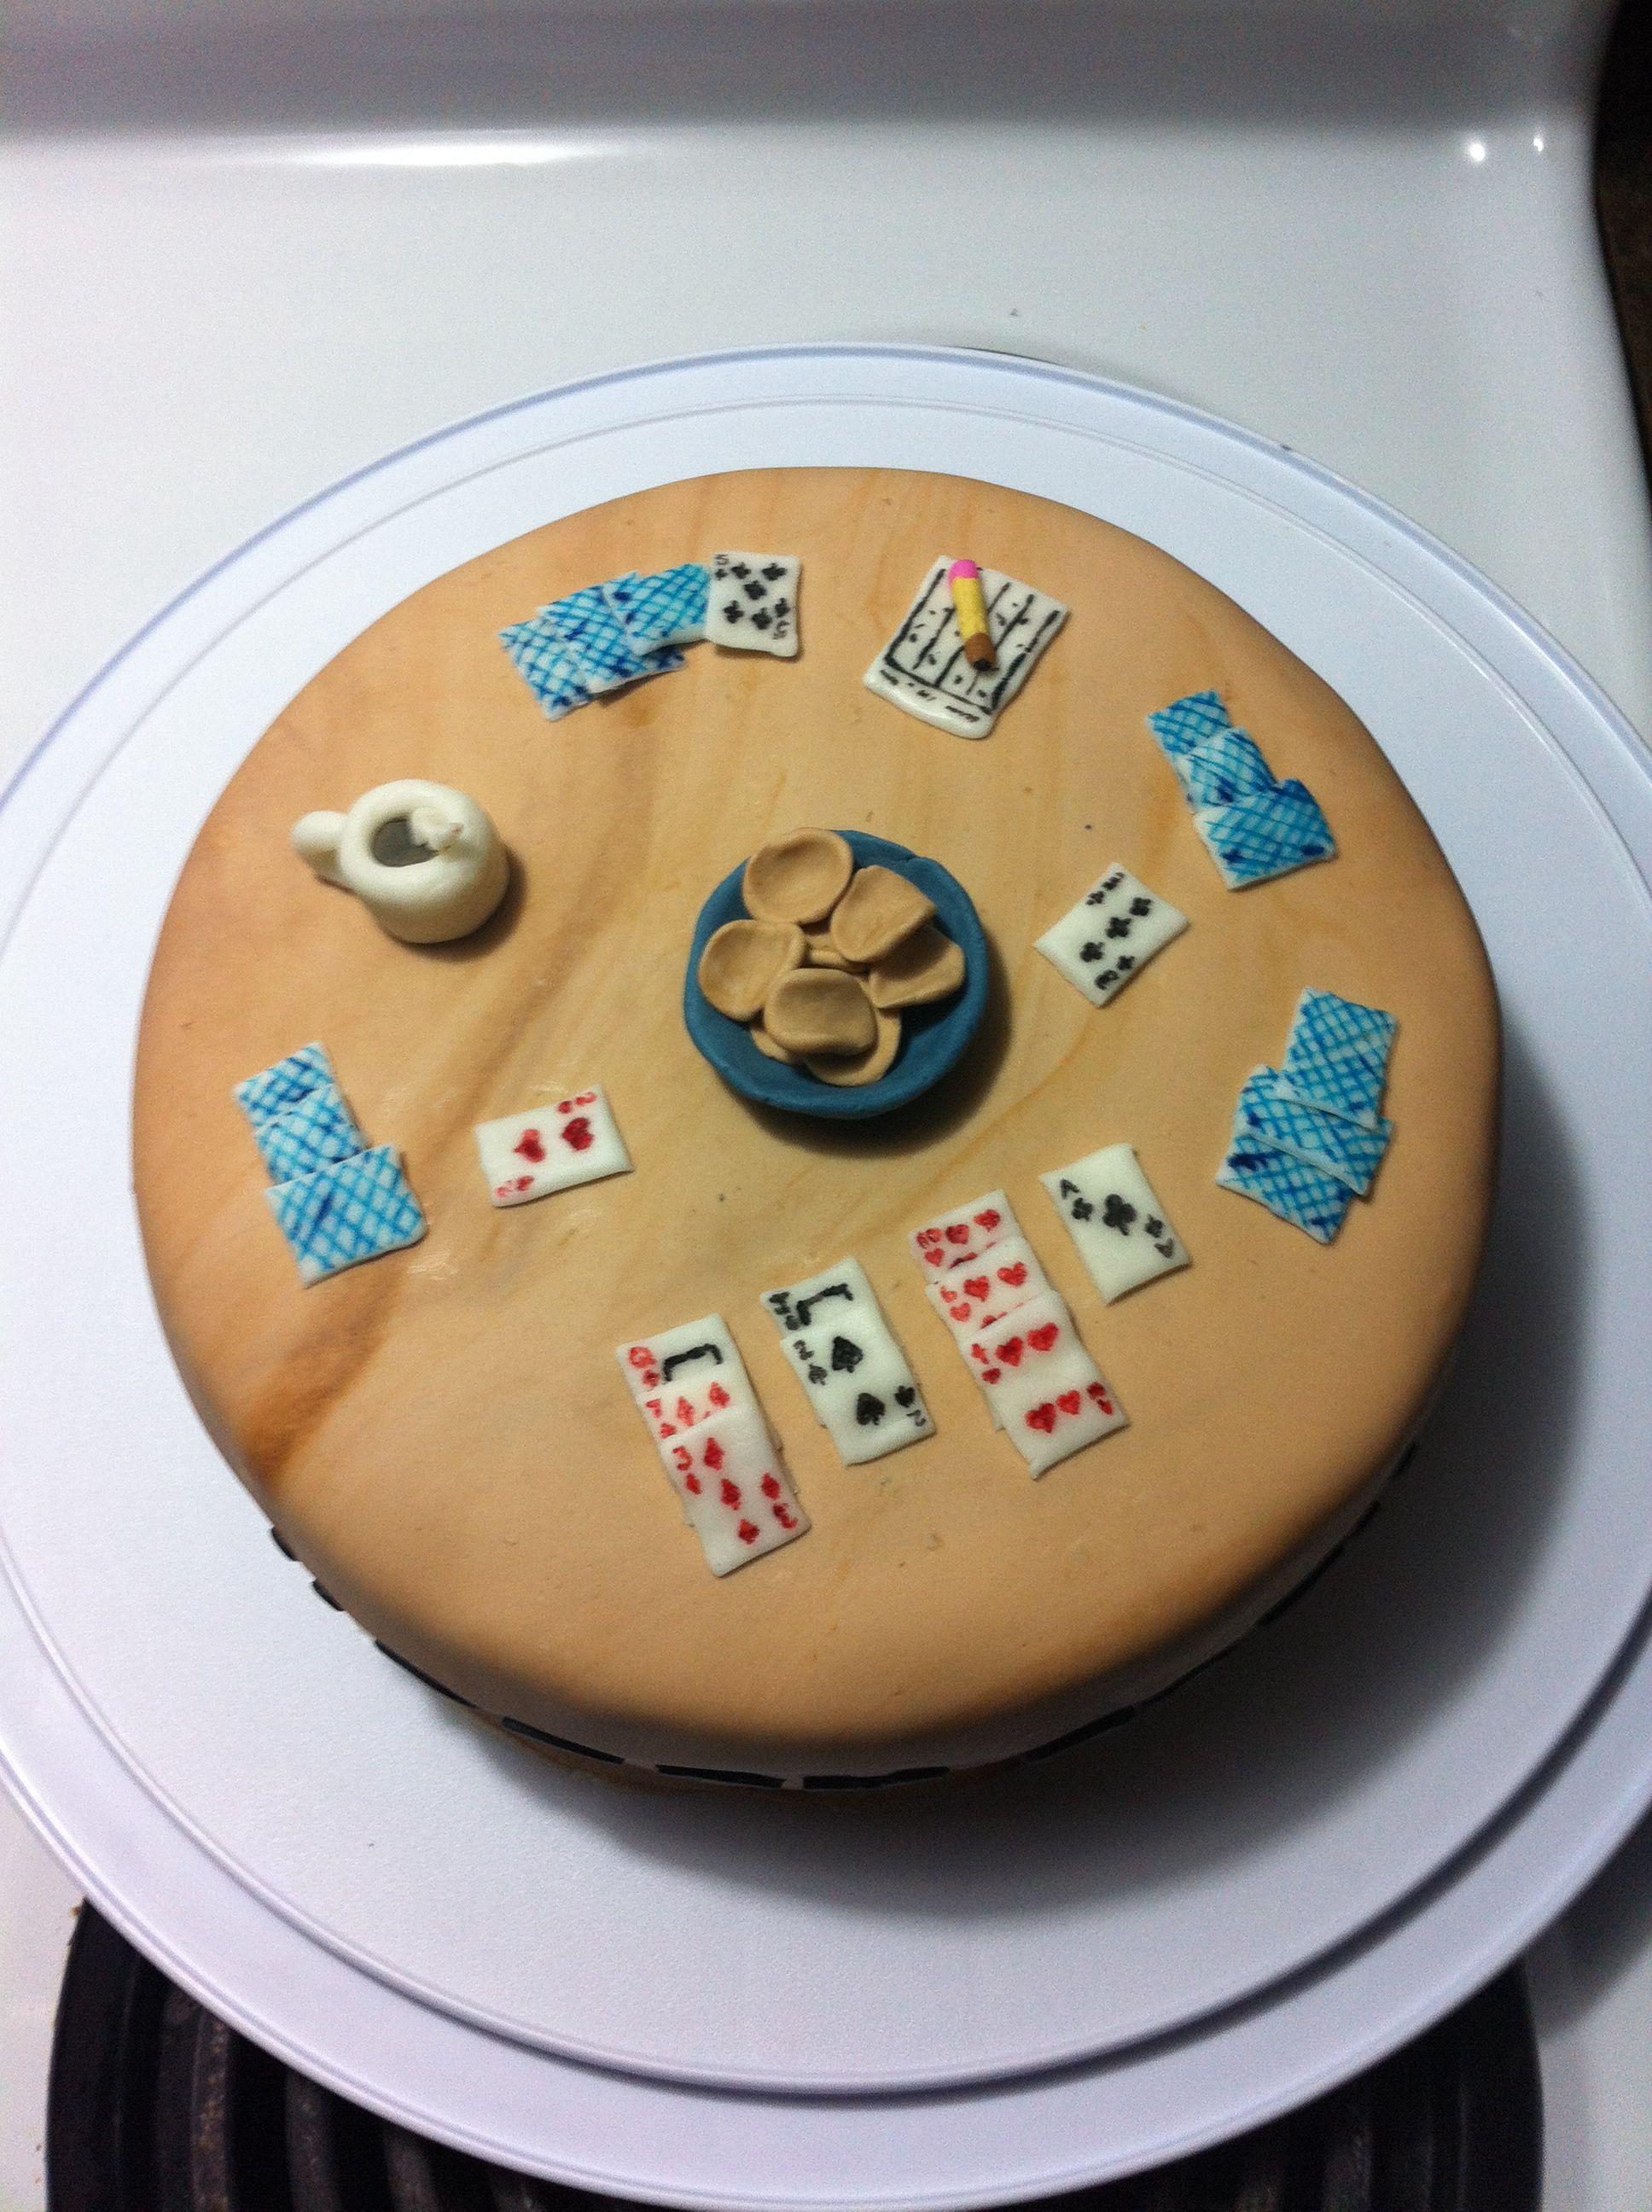 Bridge card game cake | My cakes | Pinterest